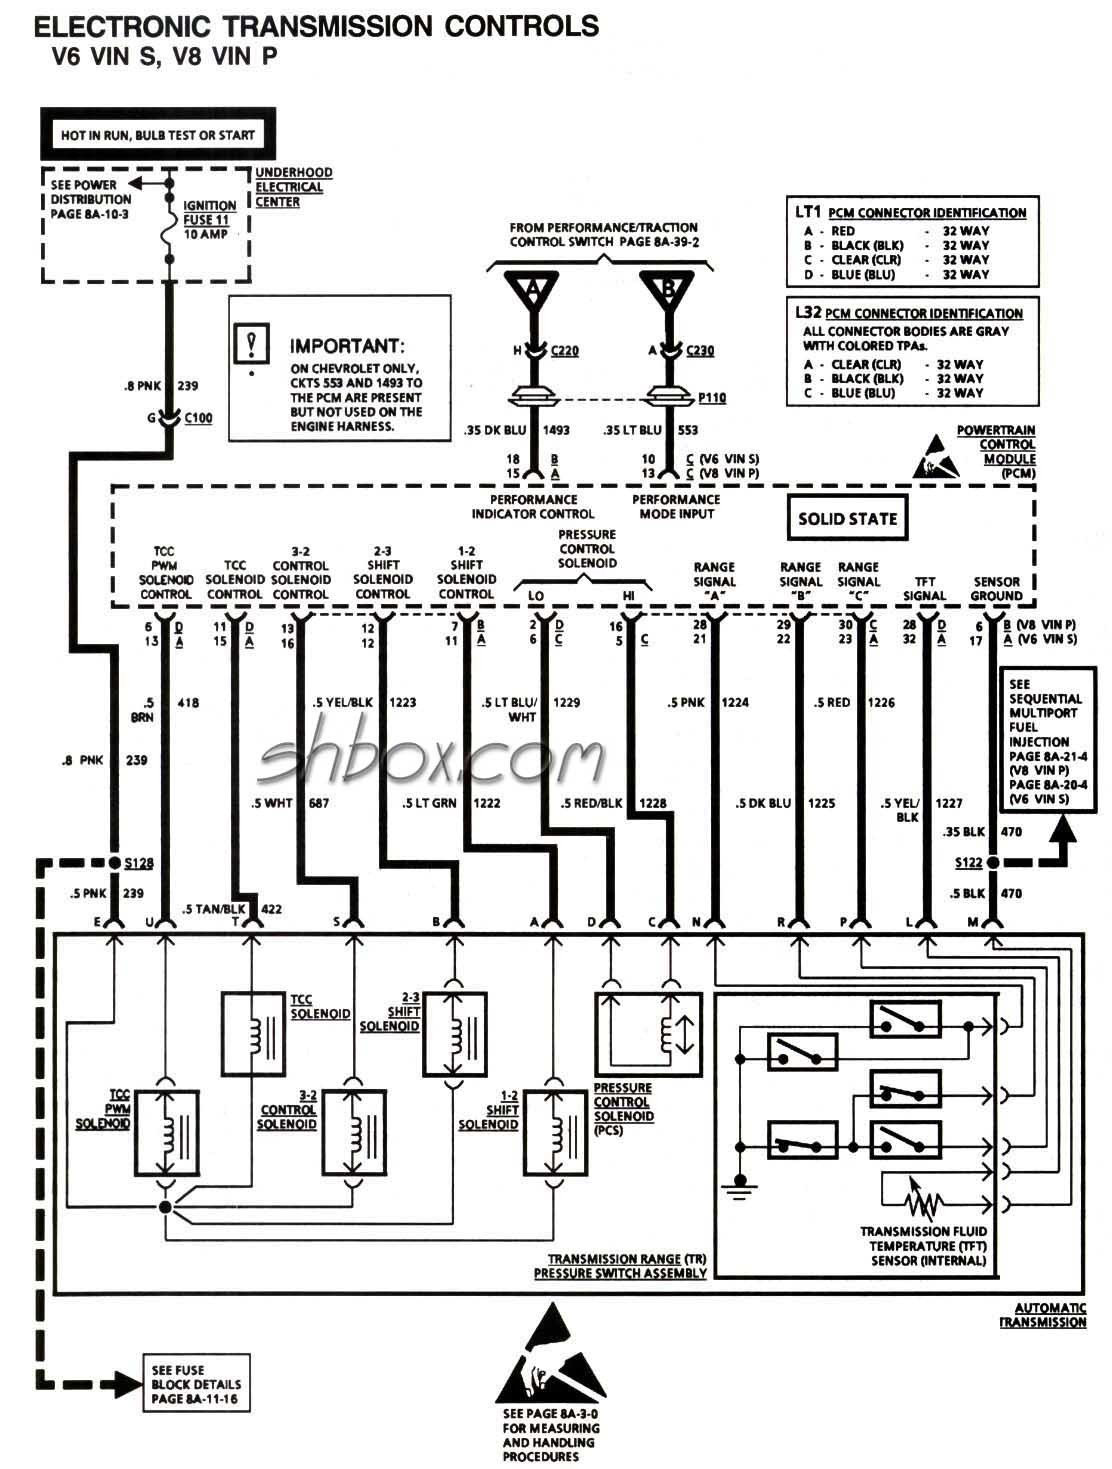 4l60e Wiring Diagram Wiring Diagrams Schematics Gm 4l60e Wiring Diagram Wiring Diagrams Schematics 4l60e Wiring Diagram 4l60e Wiring Diagram Connector